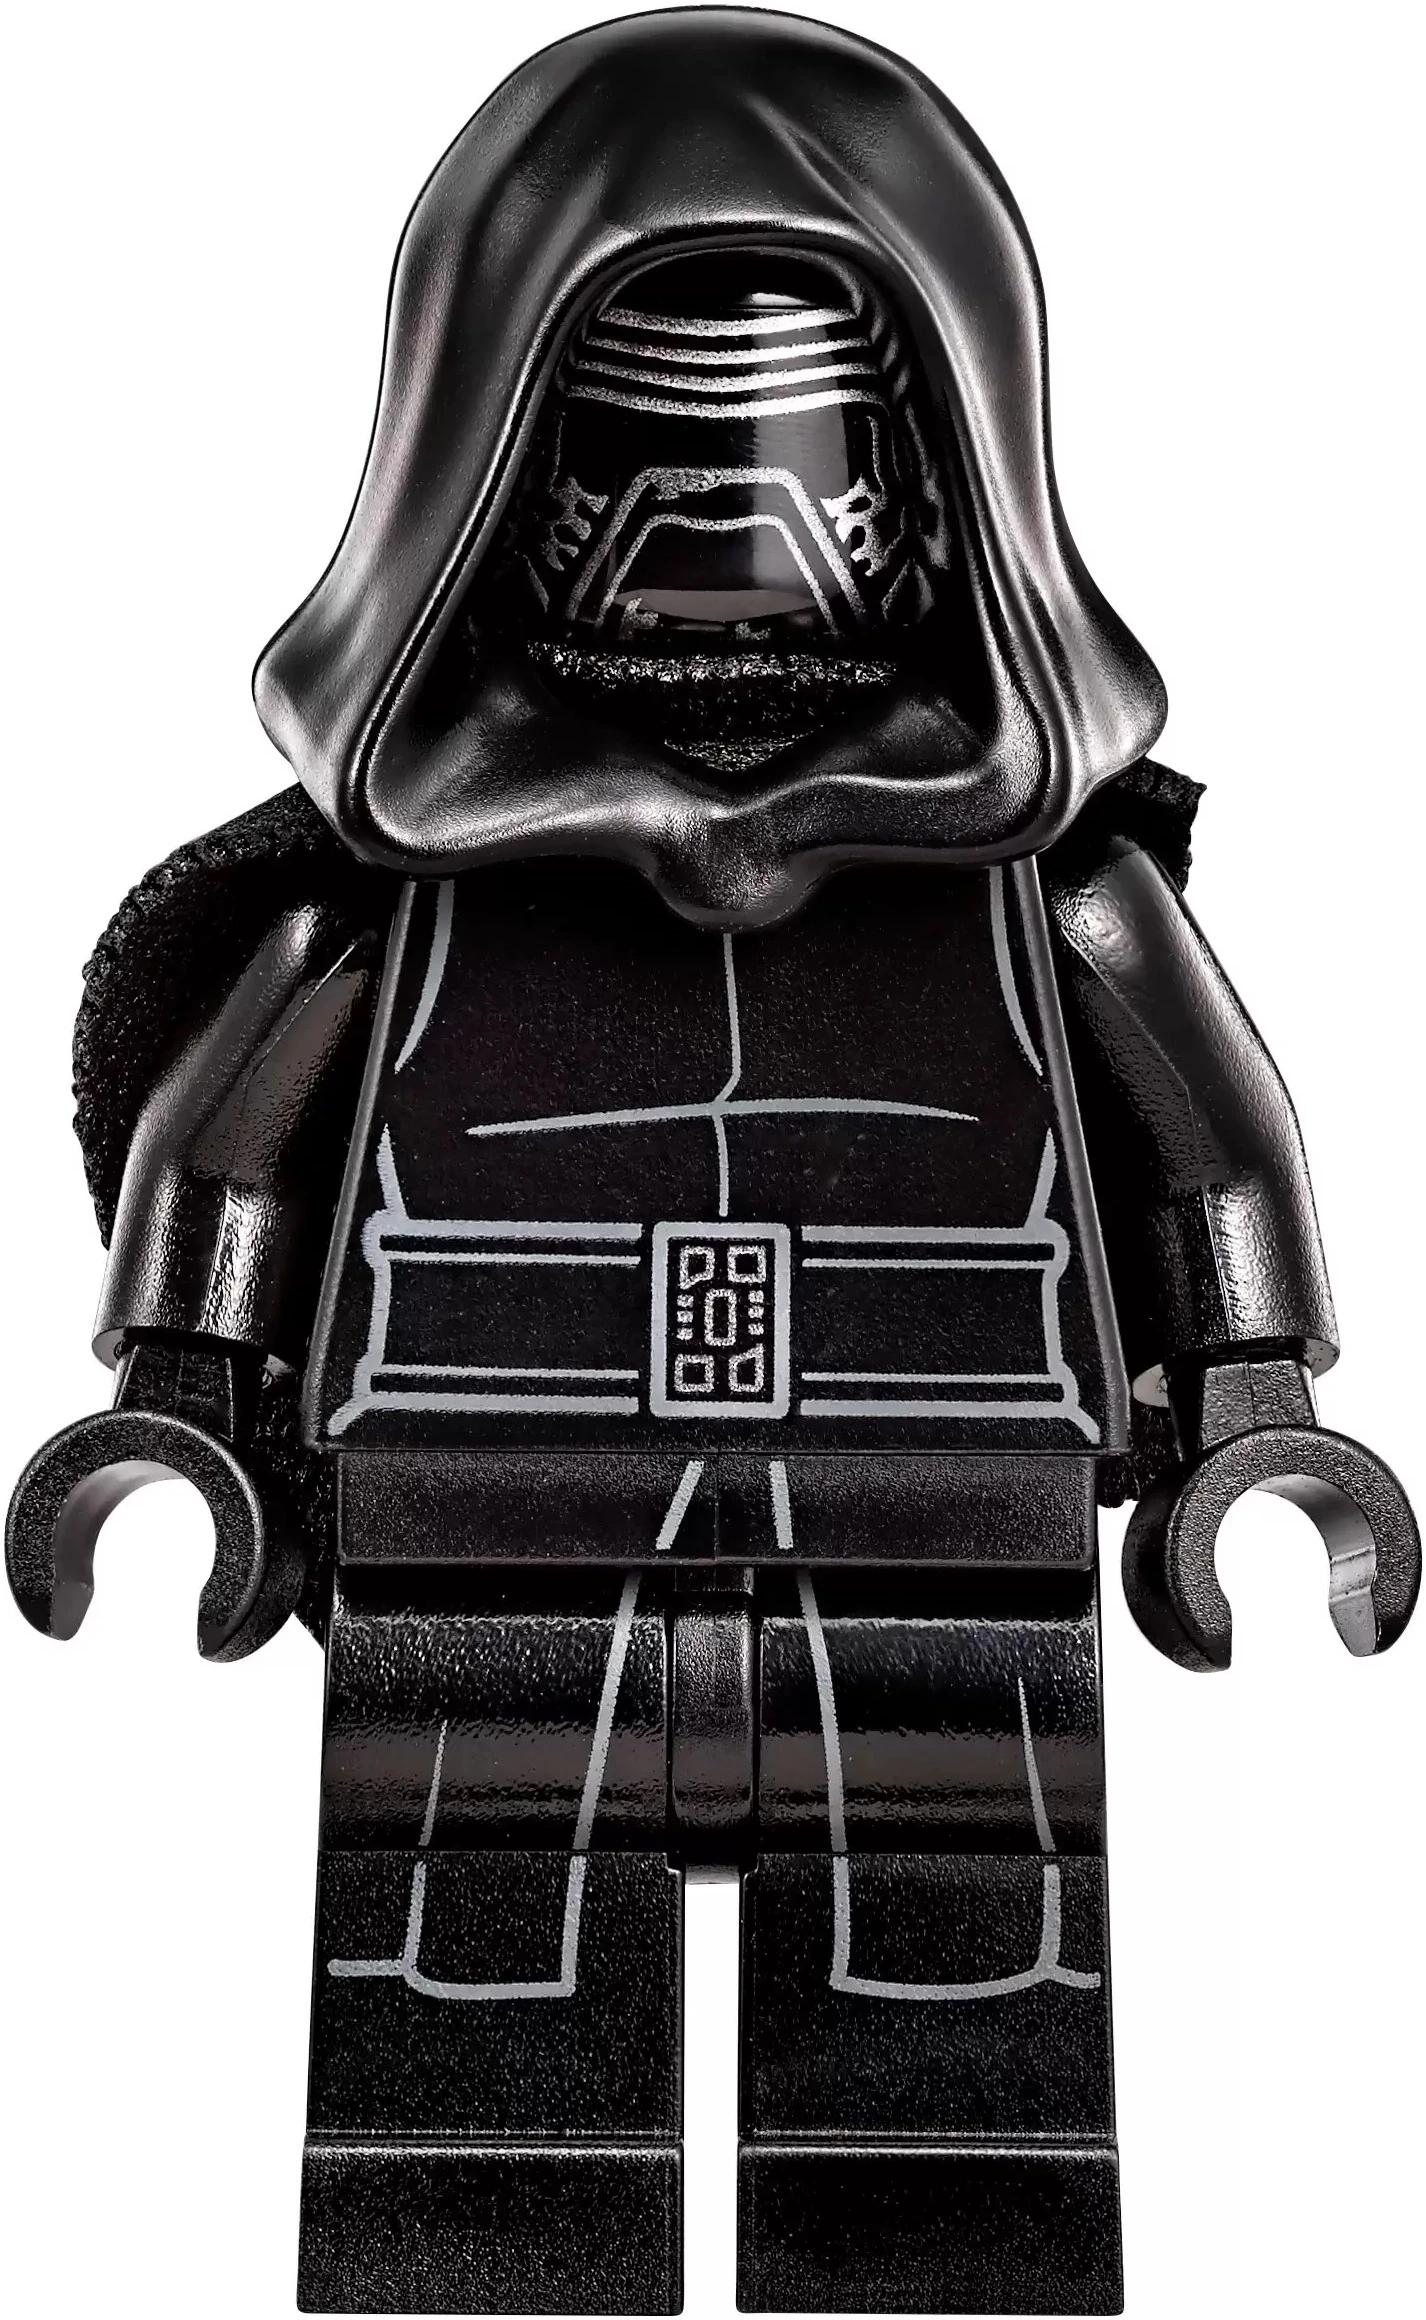 The Force Awakens Hooded Kylo Ren Star Wars